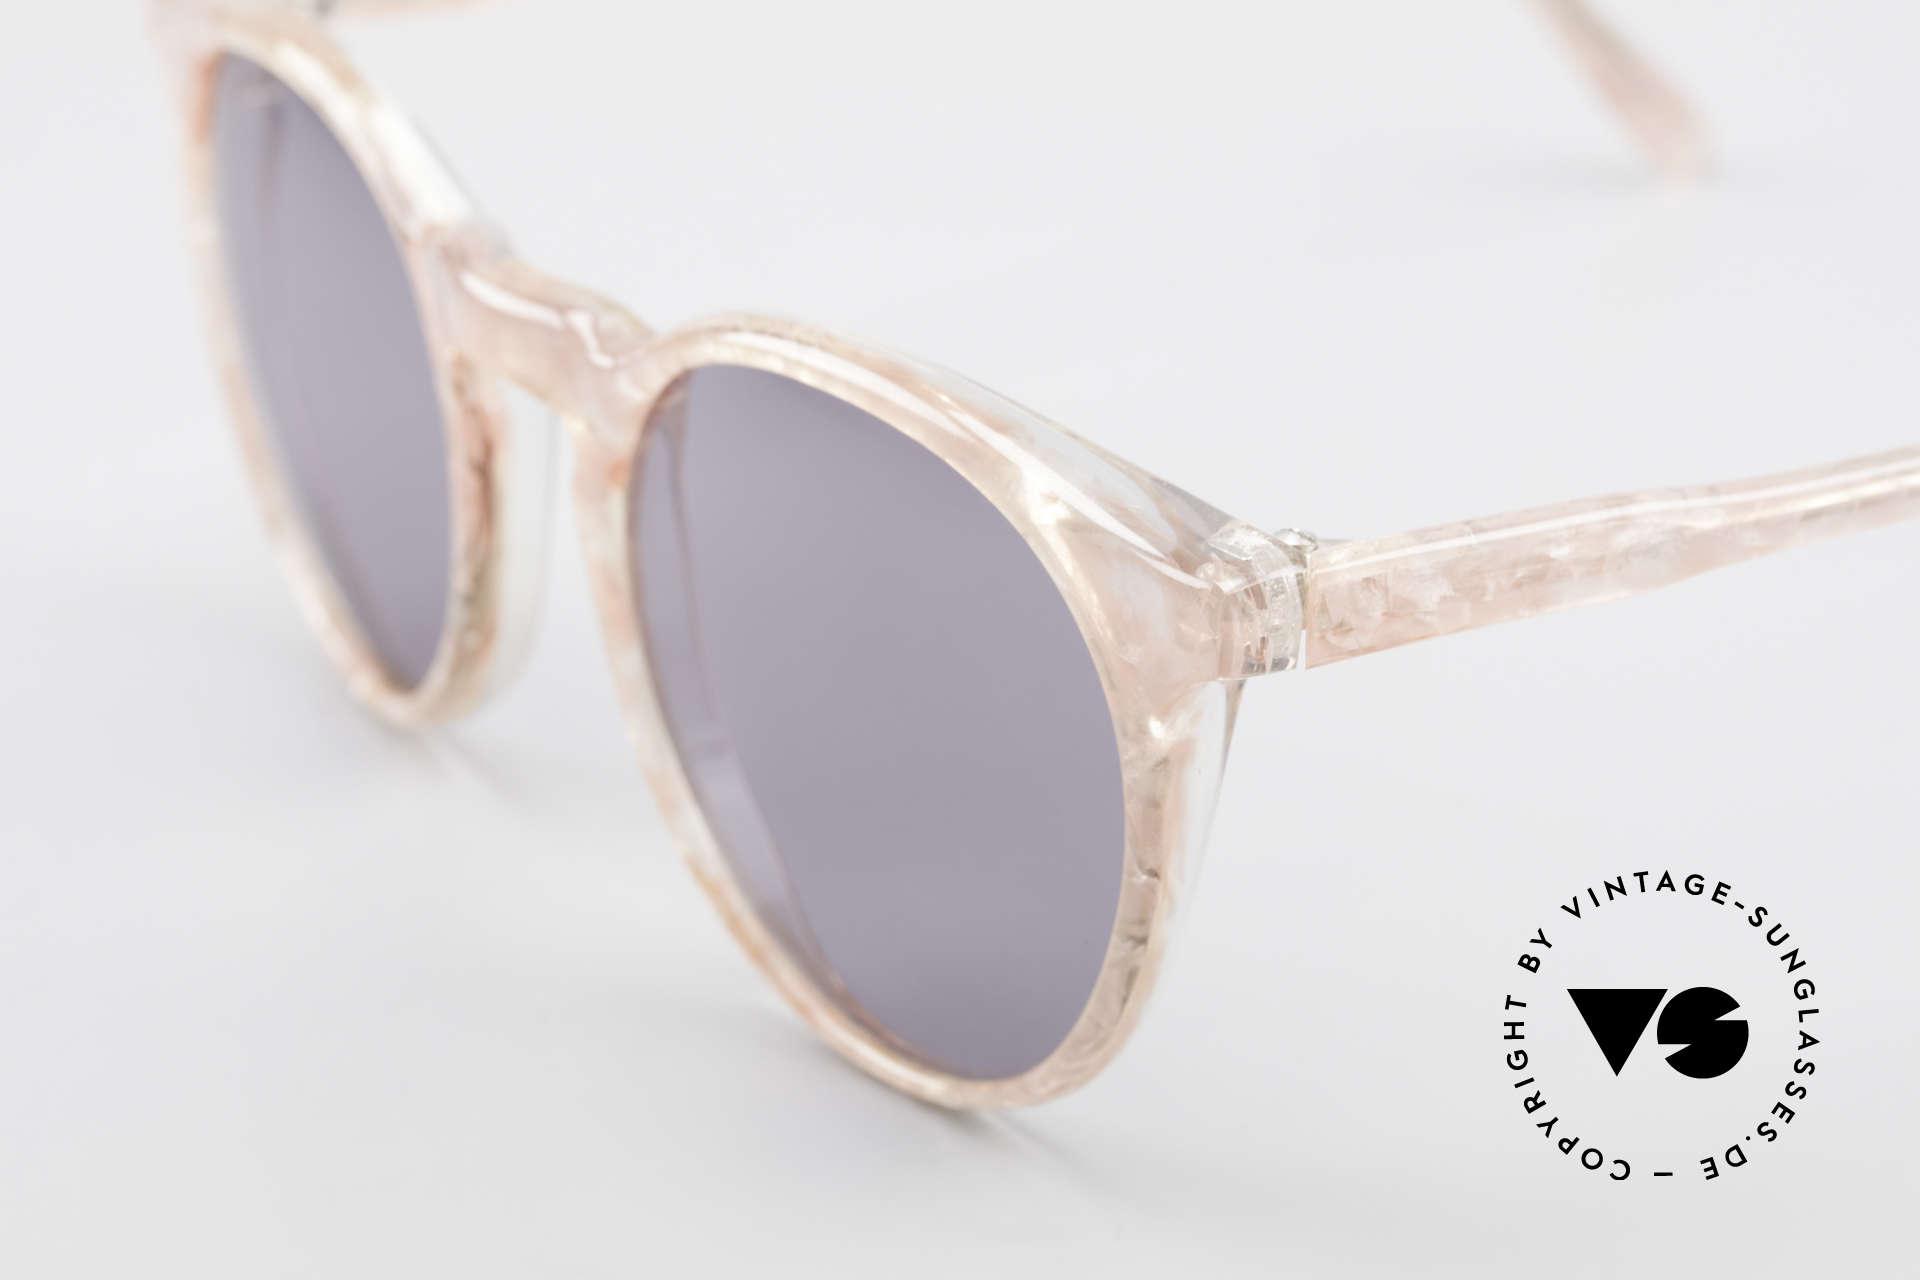 Alain Mikli 034 / 348 80's Panto Sunglasses Ladies, never worn (like all our vintage Alain Mikli specs), Made for Women